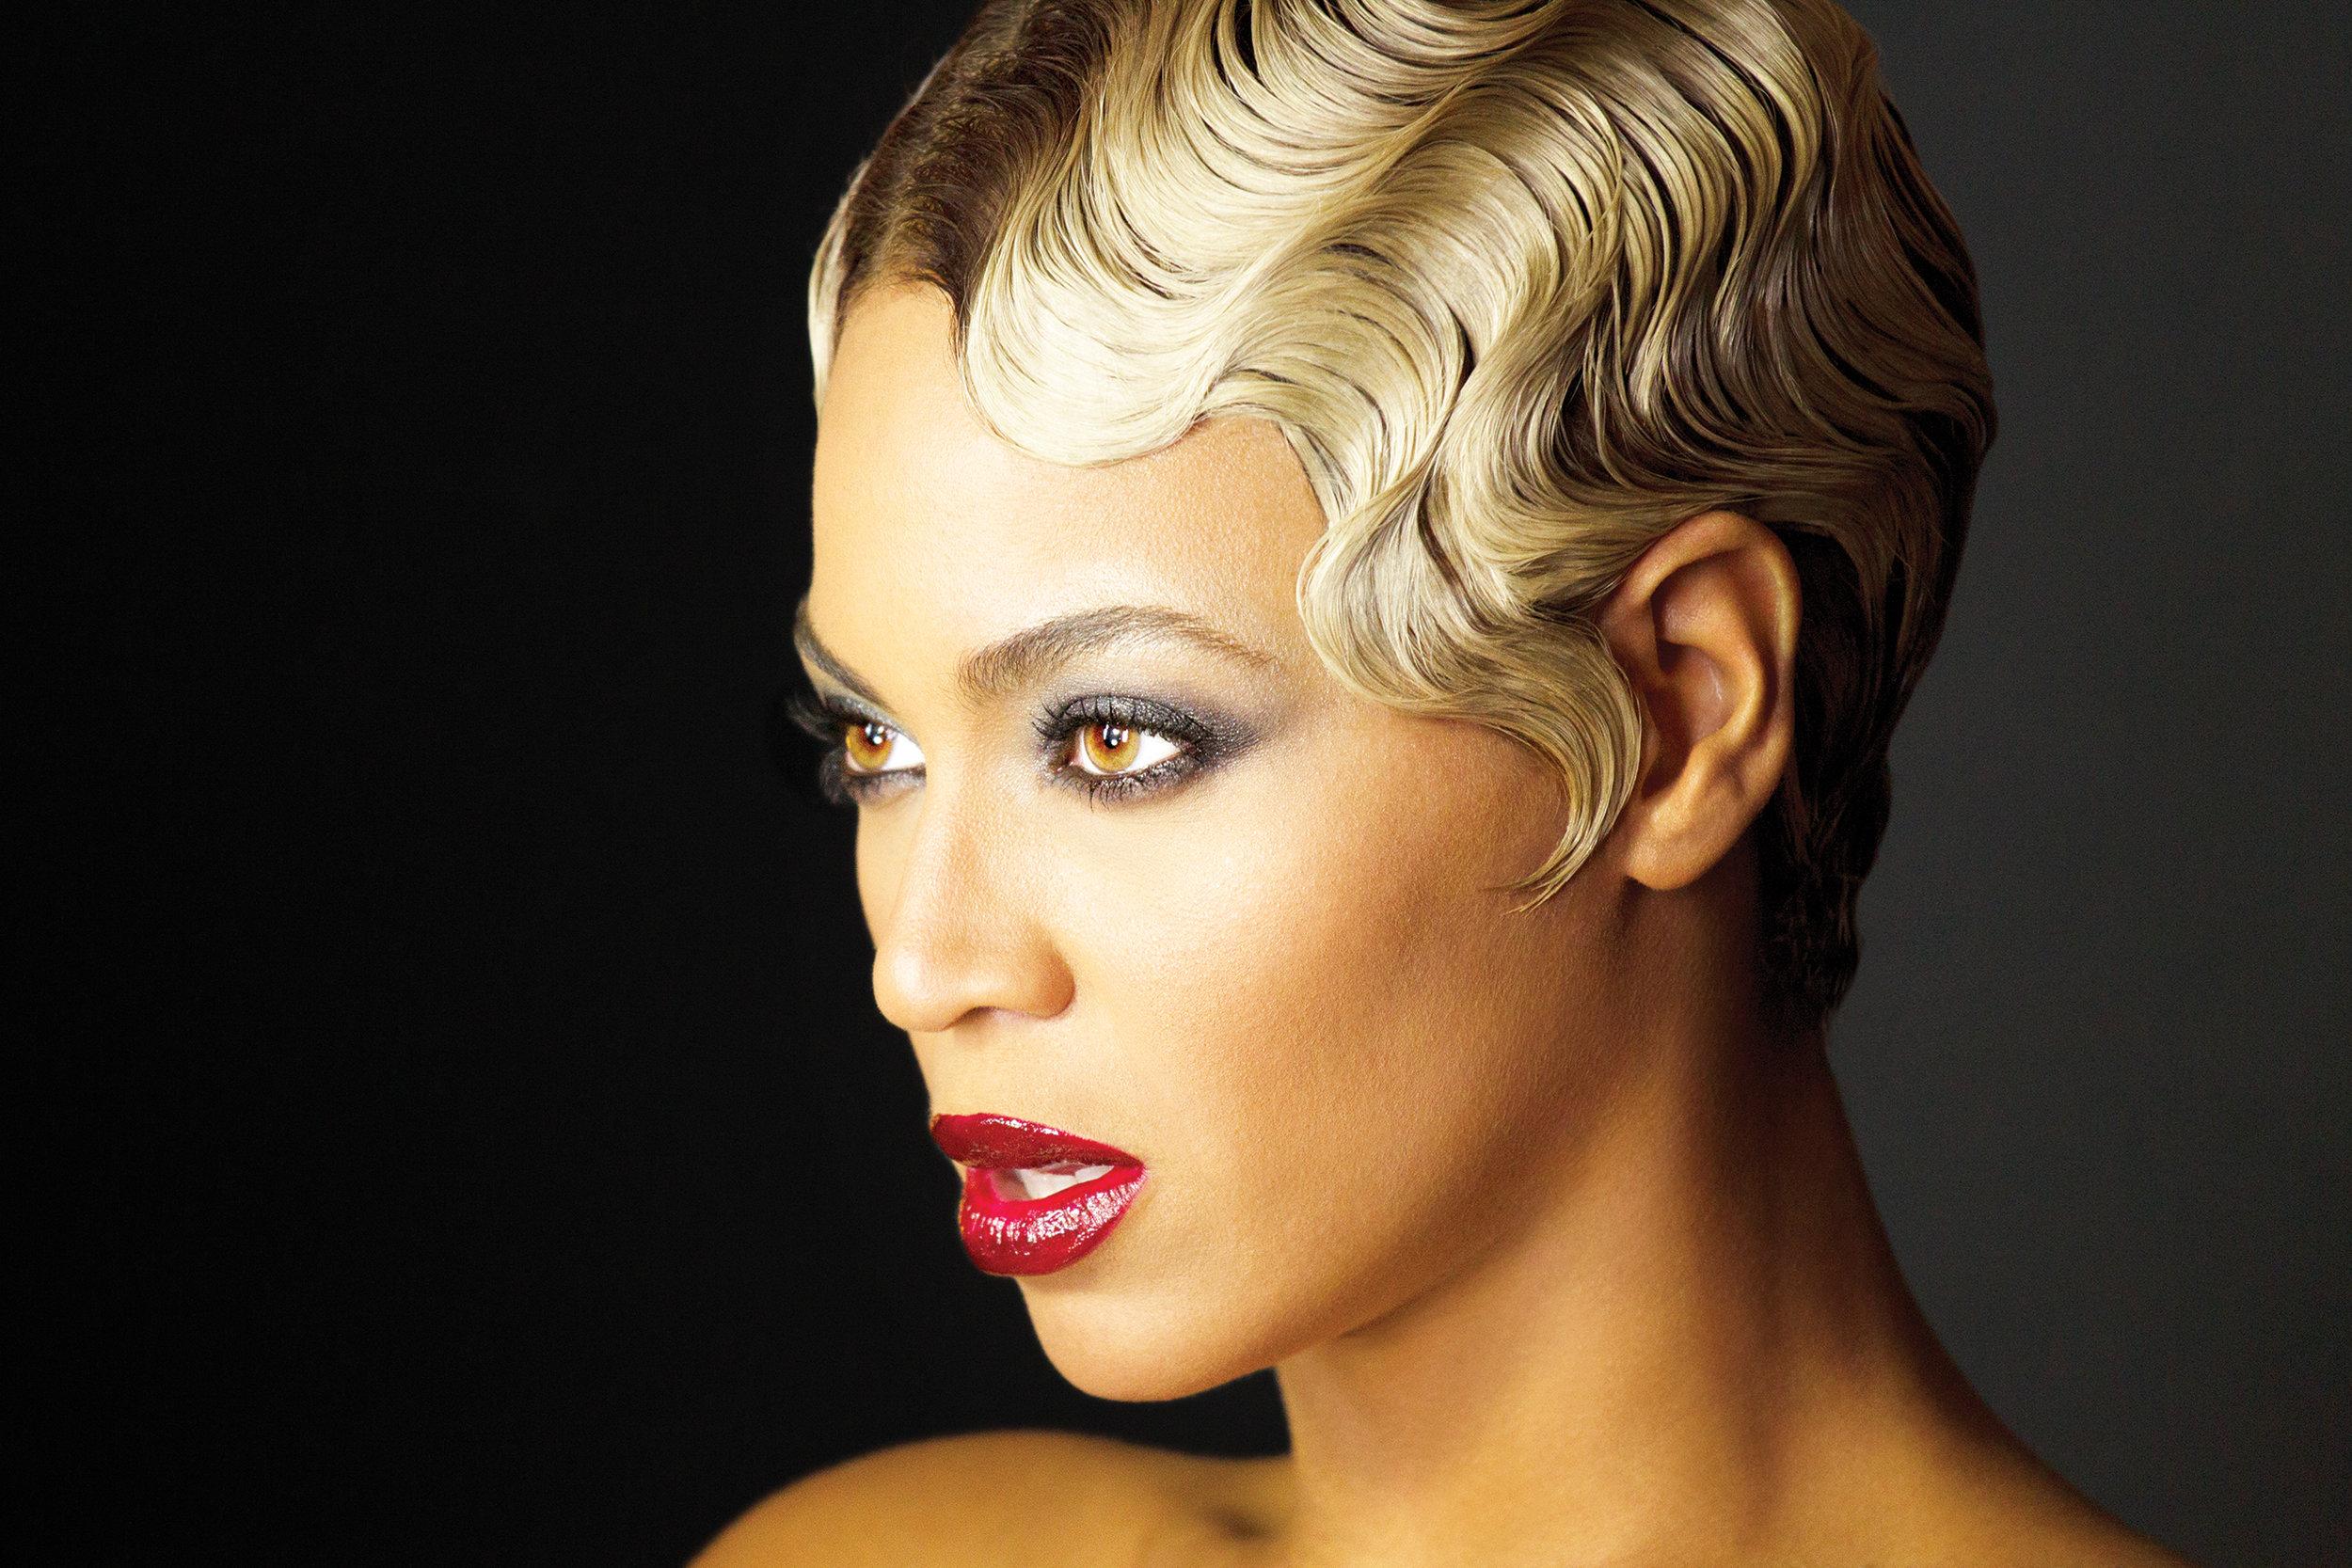 P_Beyonce_Book_60_AB3U0227-v2.jpg